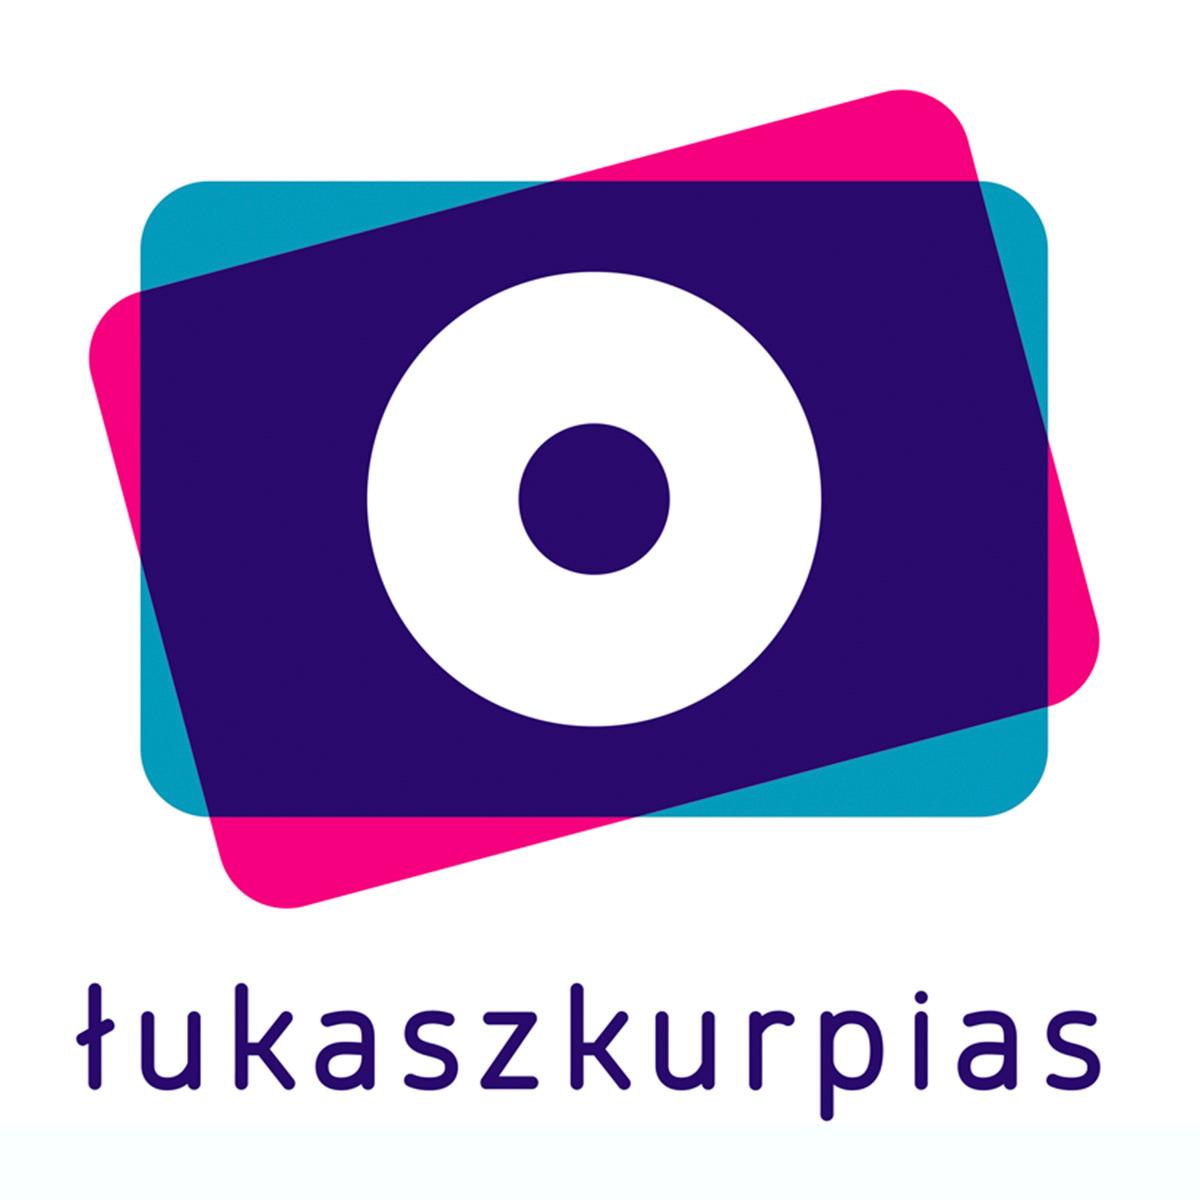 Łukasz Kurpias